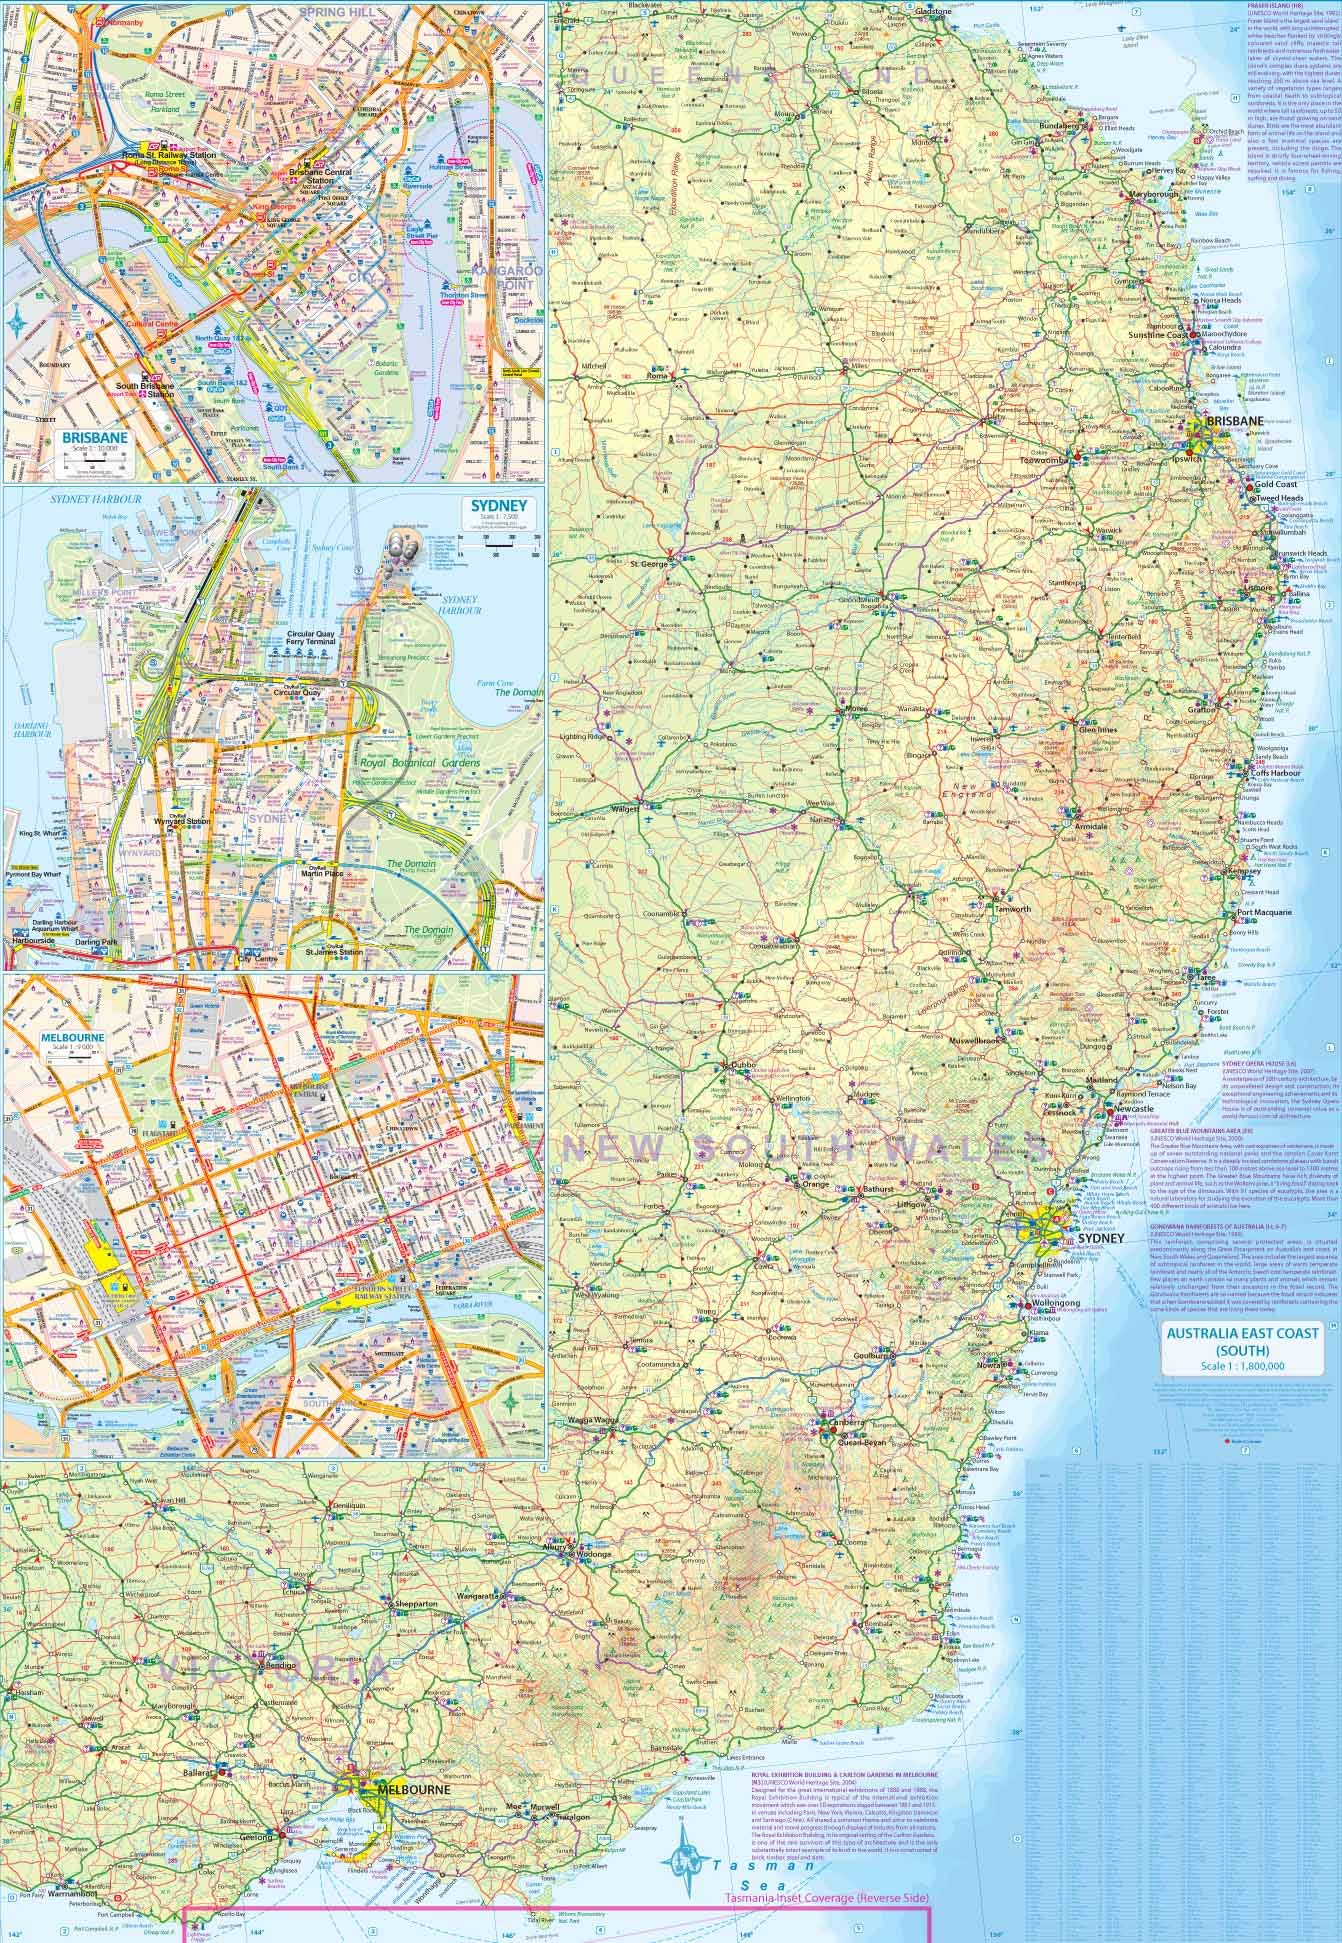 East Coast Australia Map Detailed.Australia East Coast Travel Reference Map Itmb Publishing